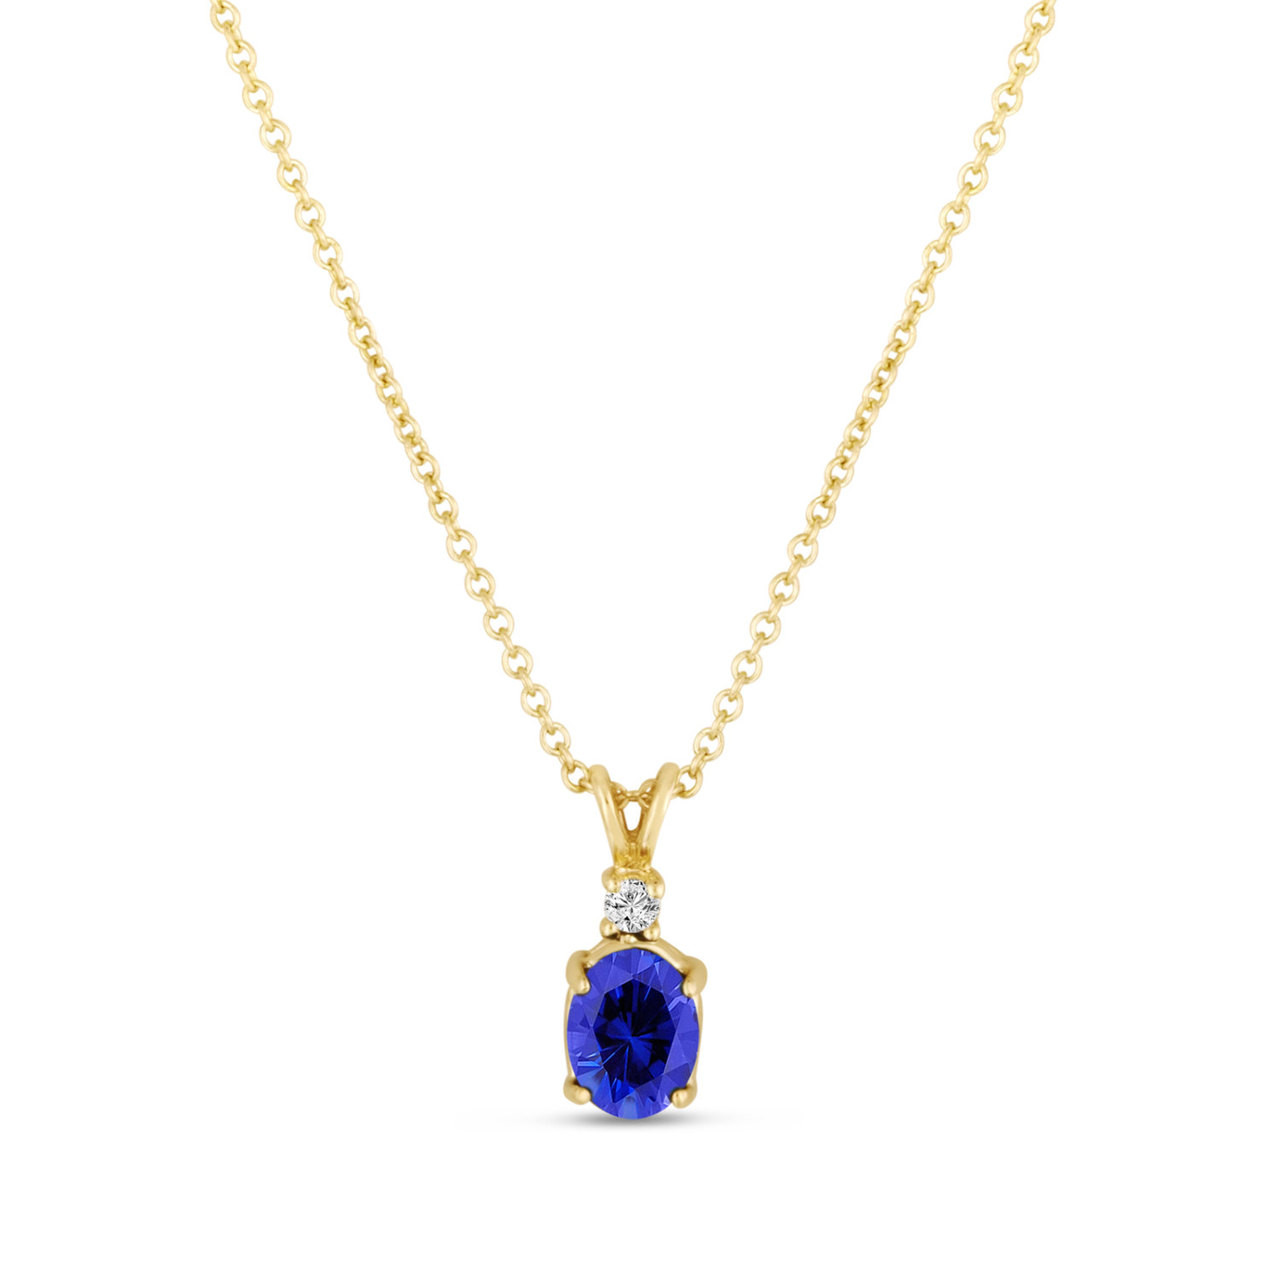 Oval blue sapphire diamond solitaire pendant necklace 14k yellow oval blue sapphire diamond solitaire pendant necklace 14k yellow gold 128 carat handmade aloadofball Image collections